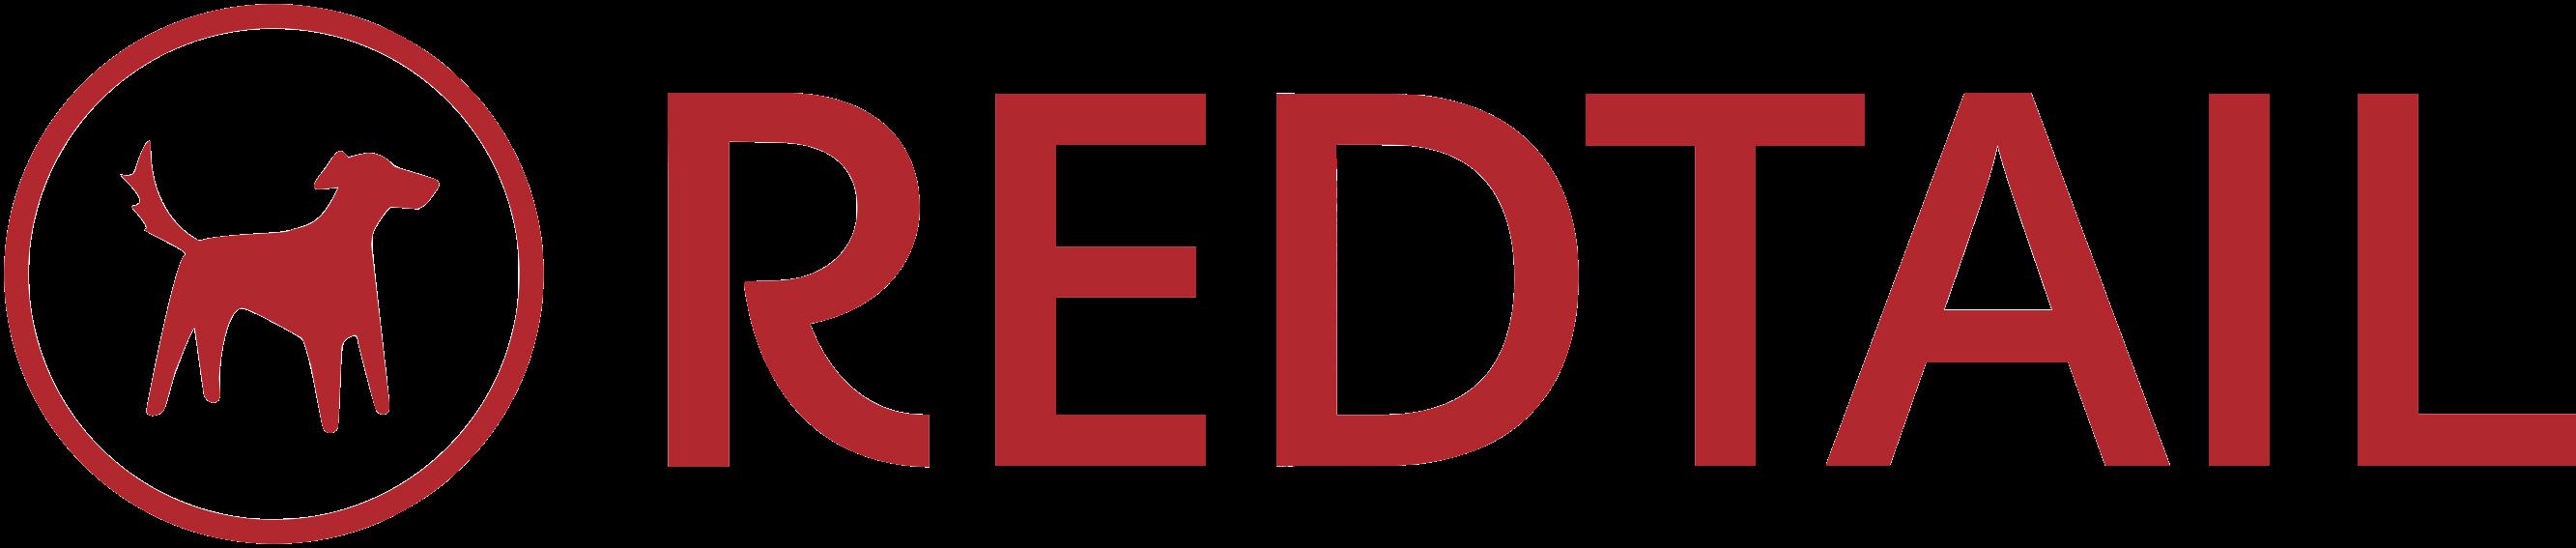 redtail-logo